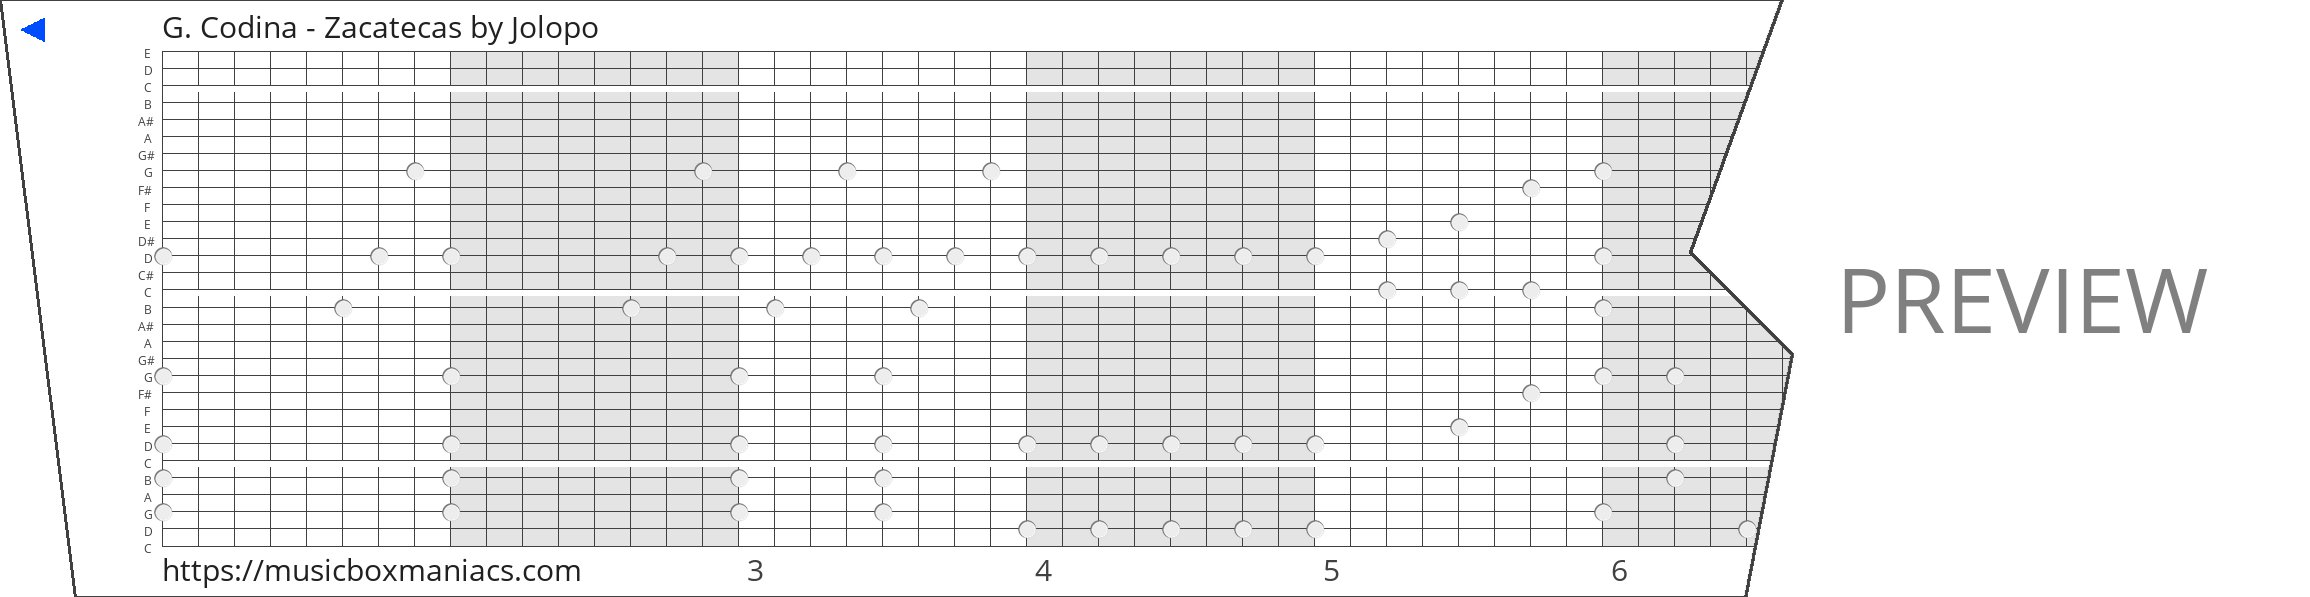 G. Codina - Zacatecas 30 note music box paper strip